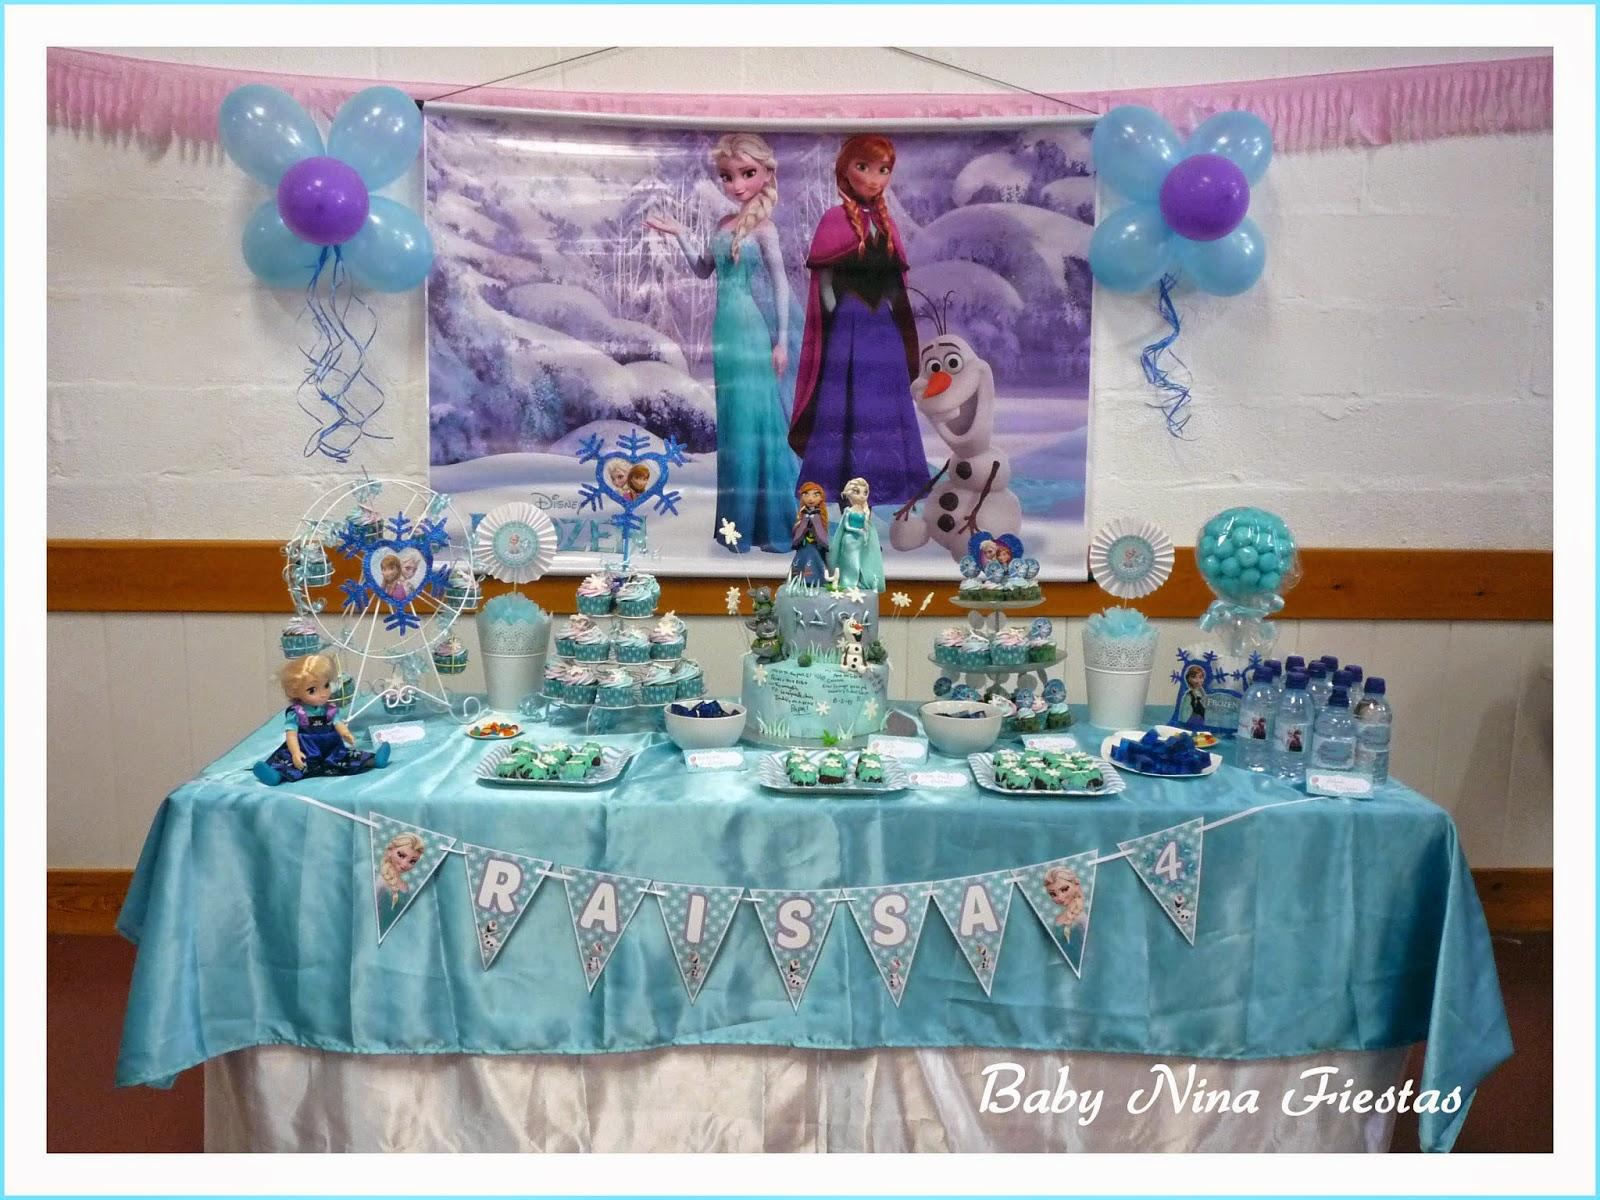 Baby nina fiestas kit de fiesta y decoraci n mesa dulce for Decoracion mesa dulce